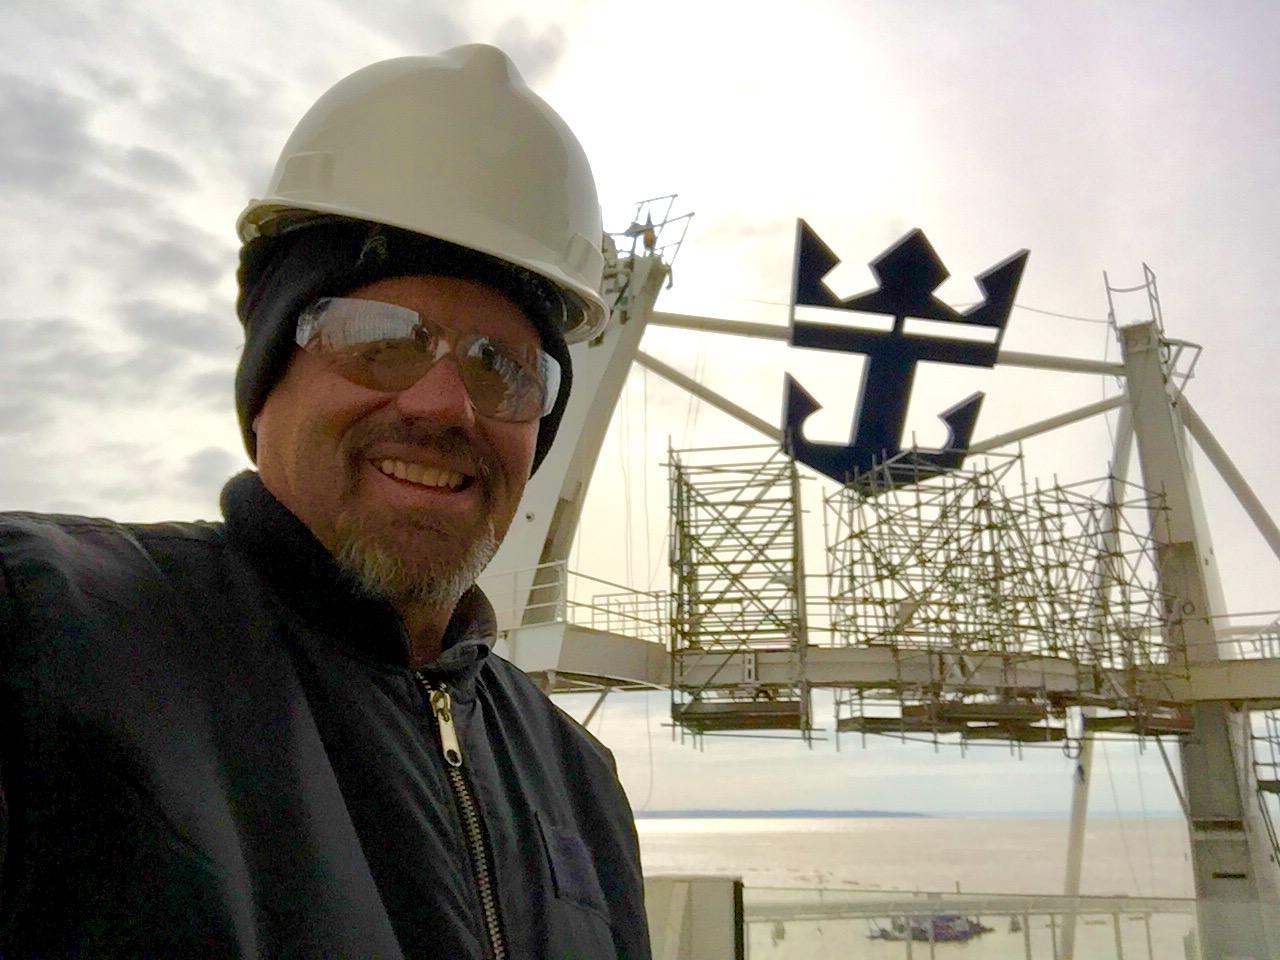 Roger at STX Shipyard, St. Nazaire, France